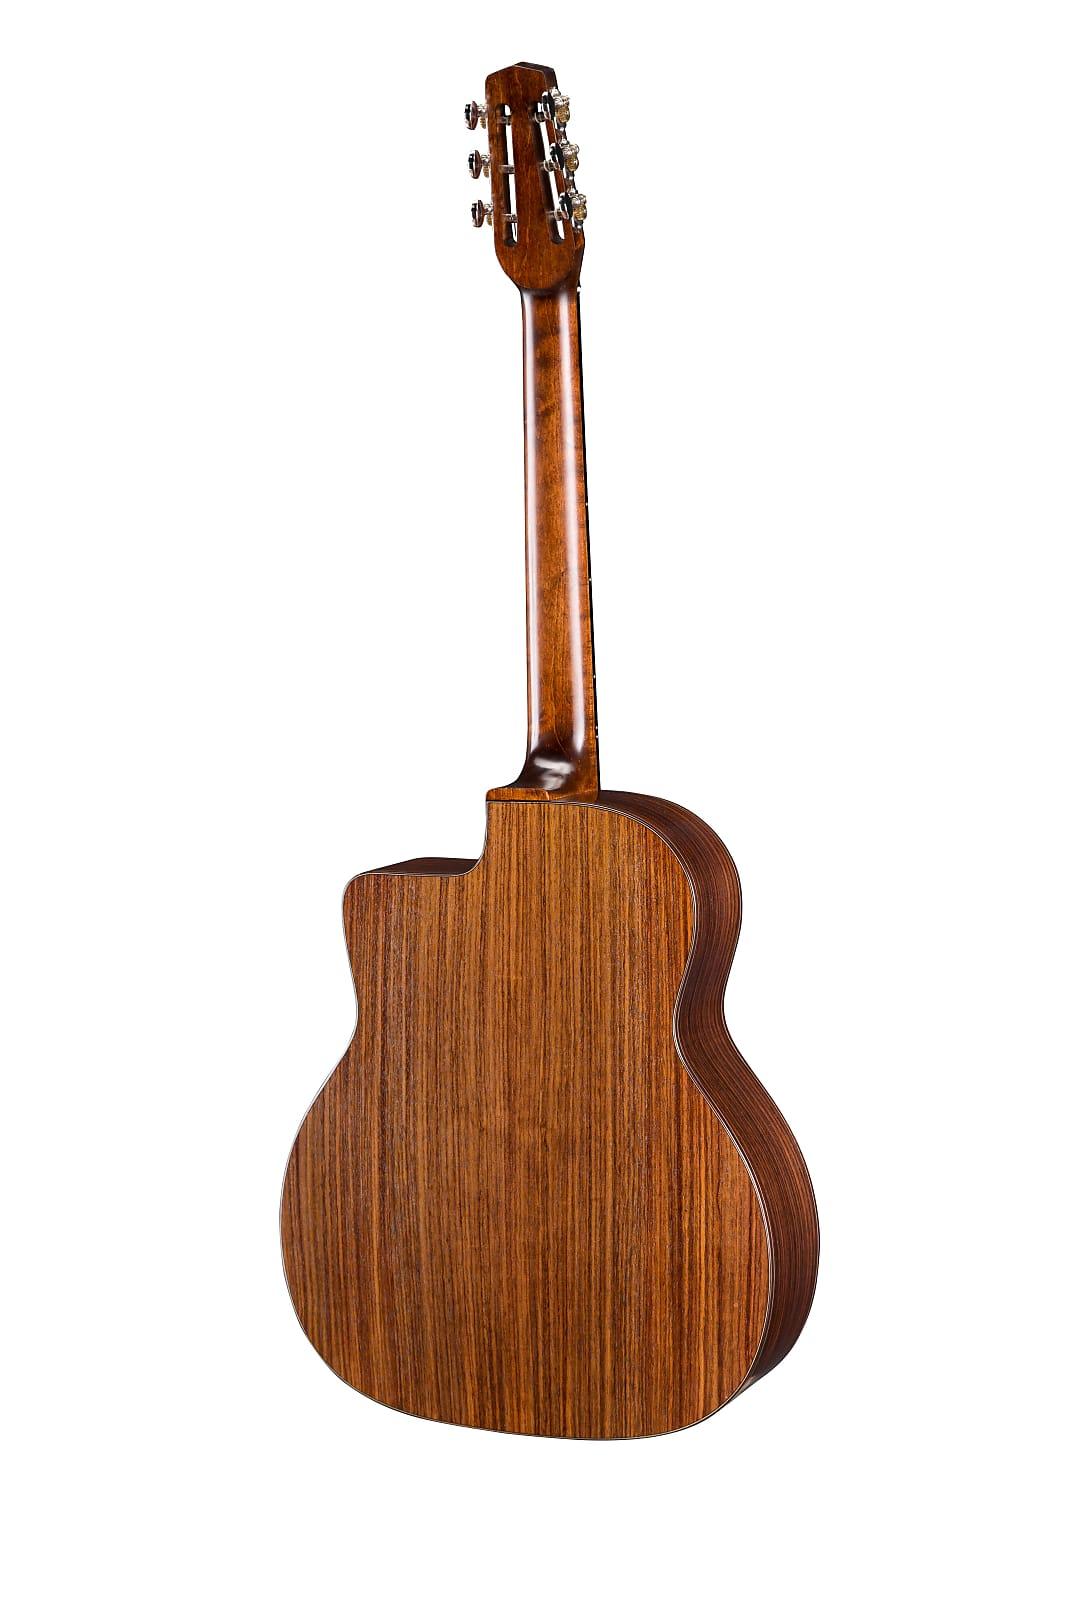 Eastman DM1-CLA Gypsy Jazz Acoustic Guitar Spruce/Rosewood